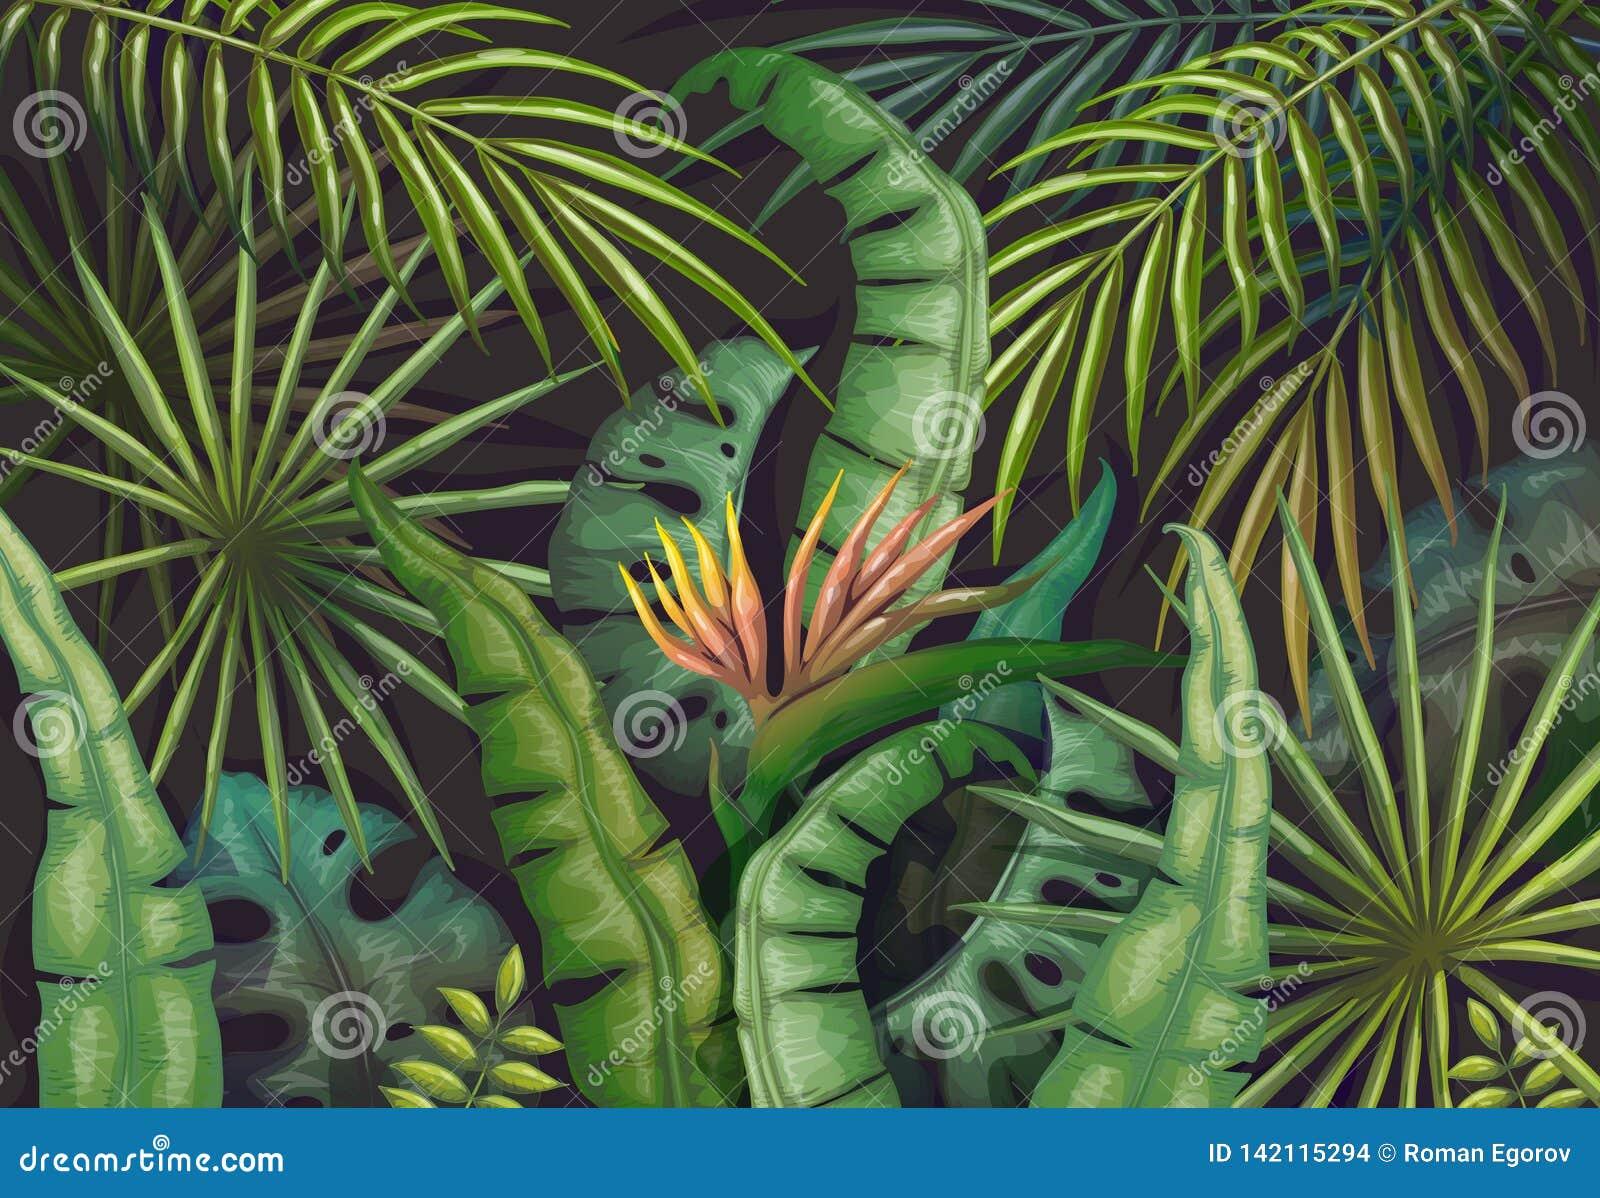 Palm Leaves Background Tropical Summer Jungle Exotic Plant Flyer Green Exotic Forest Poster Vector Vintage Jungle Stock Vector Illustration Of Leaf Nature 142115294